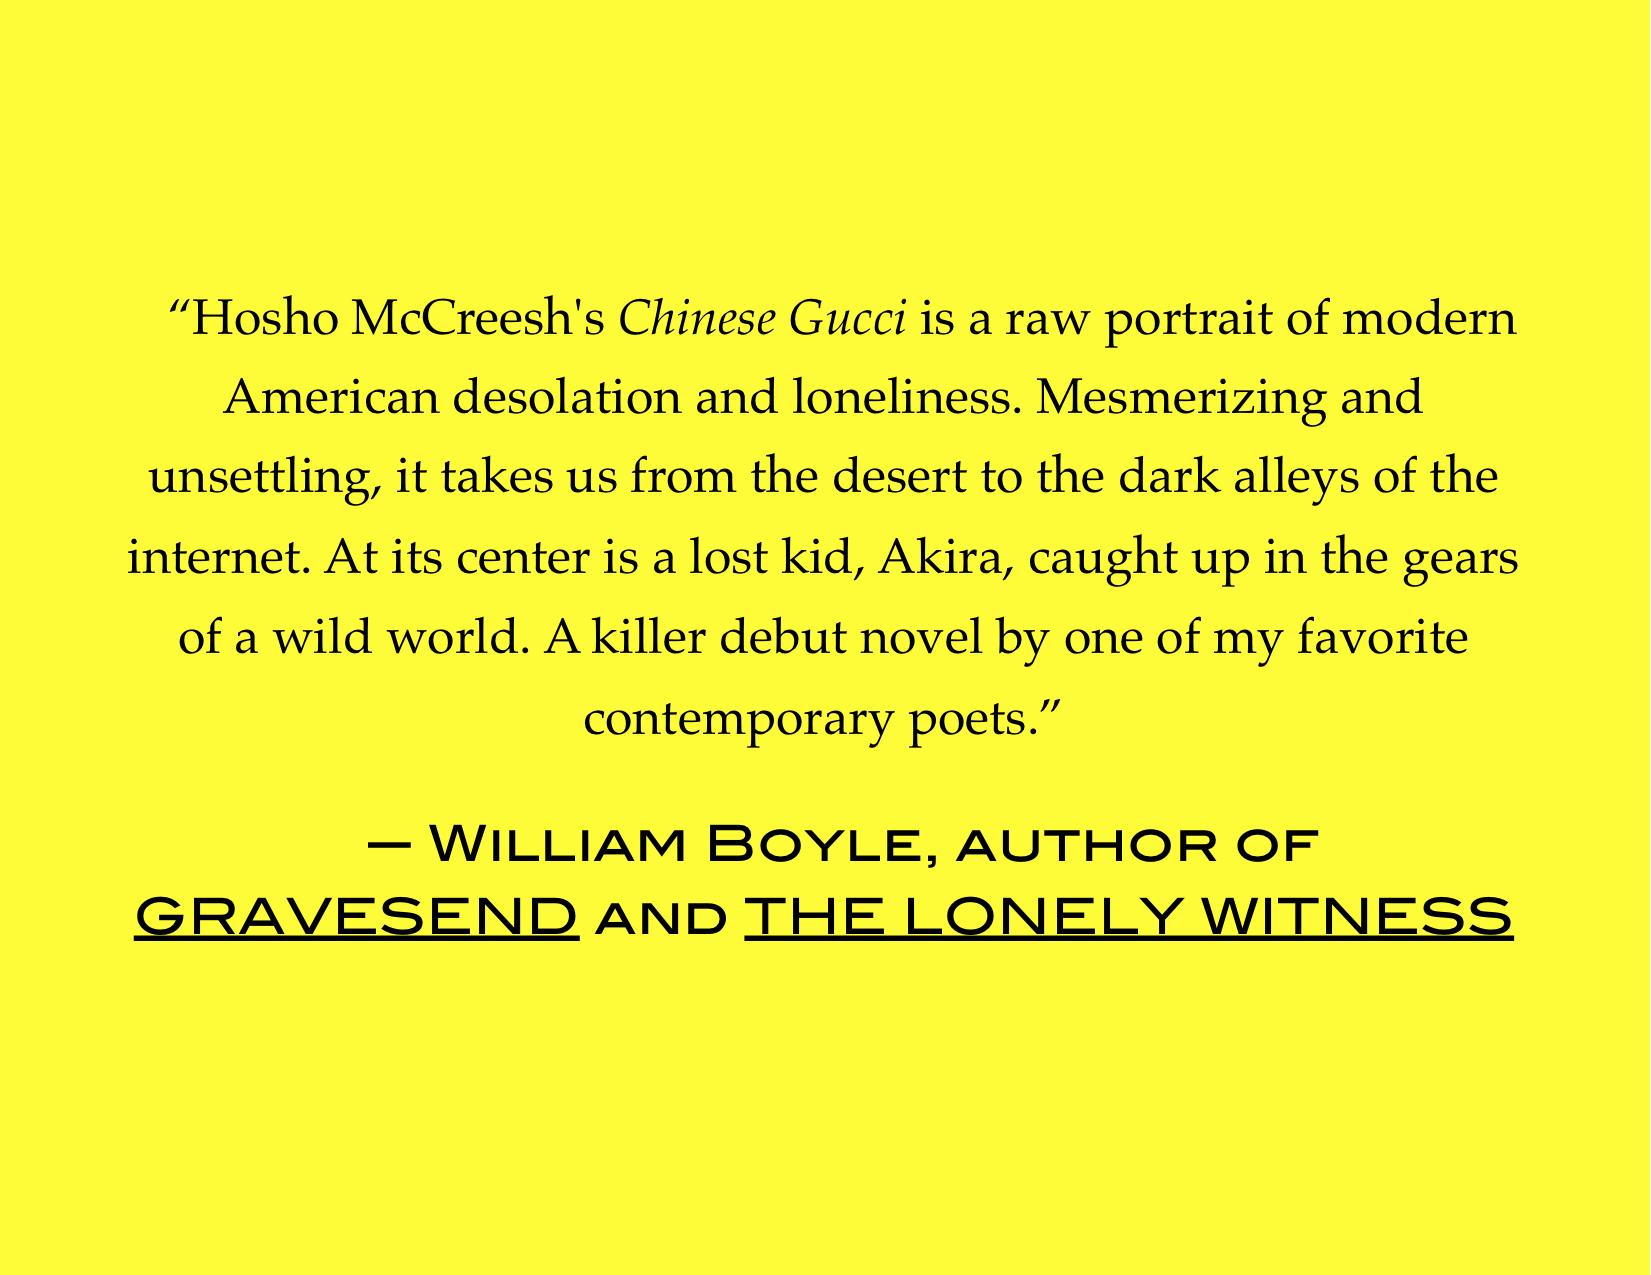 1 Boyle Blurb.png